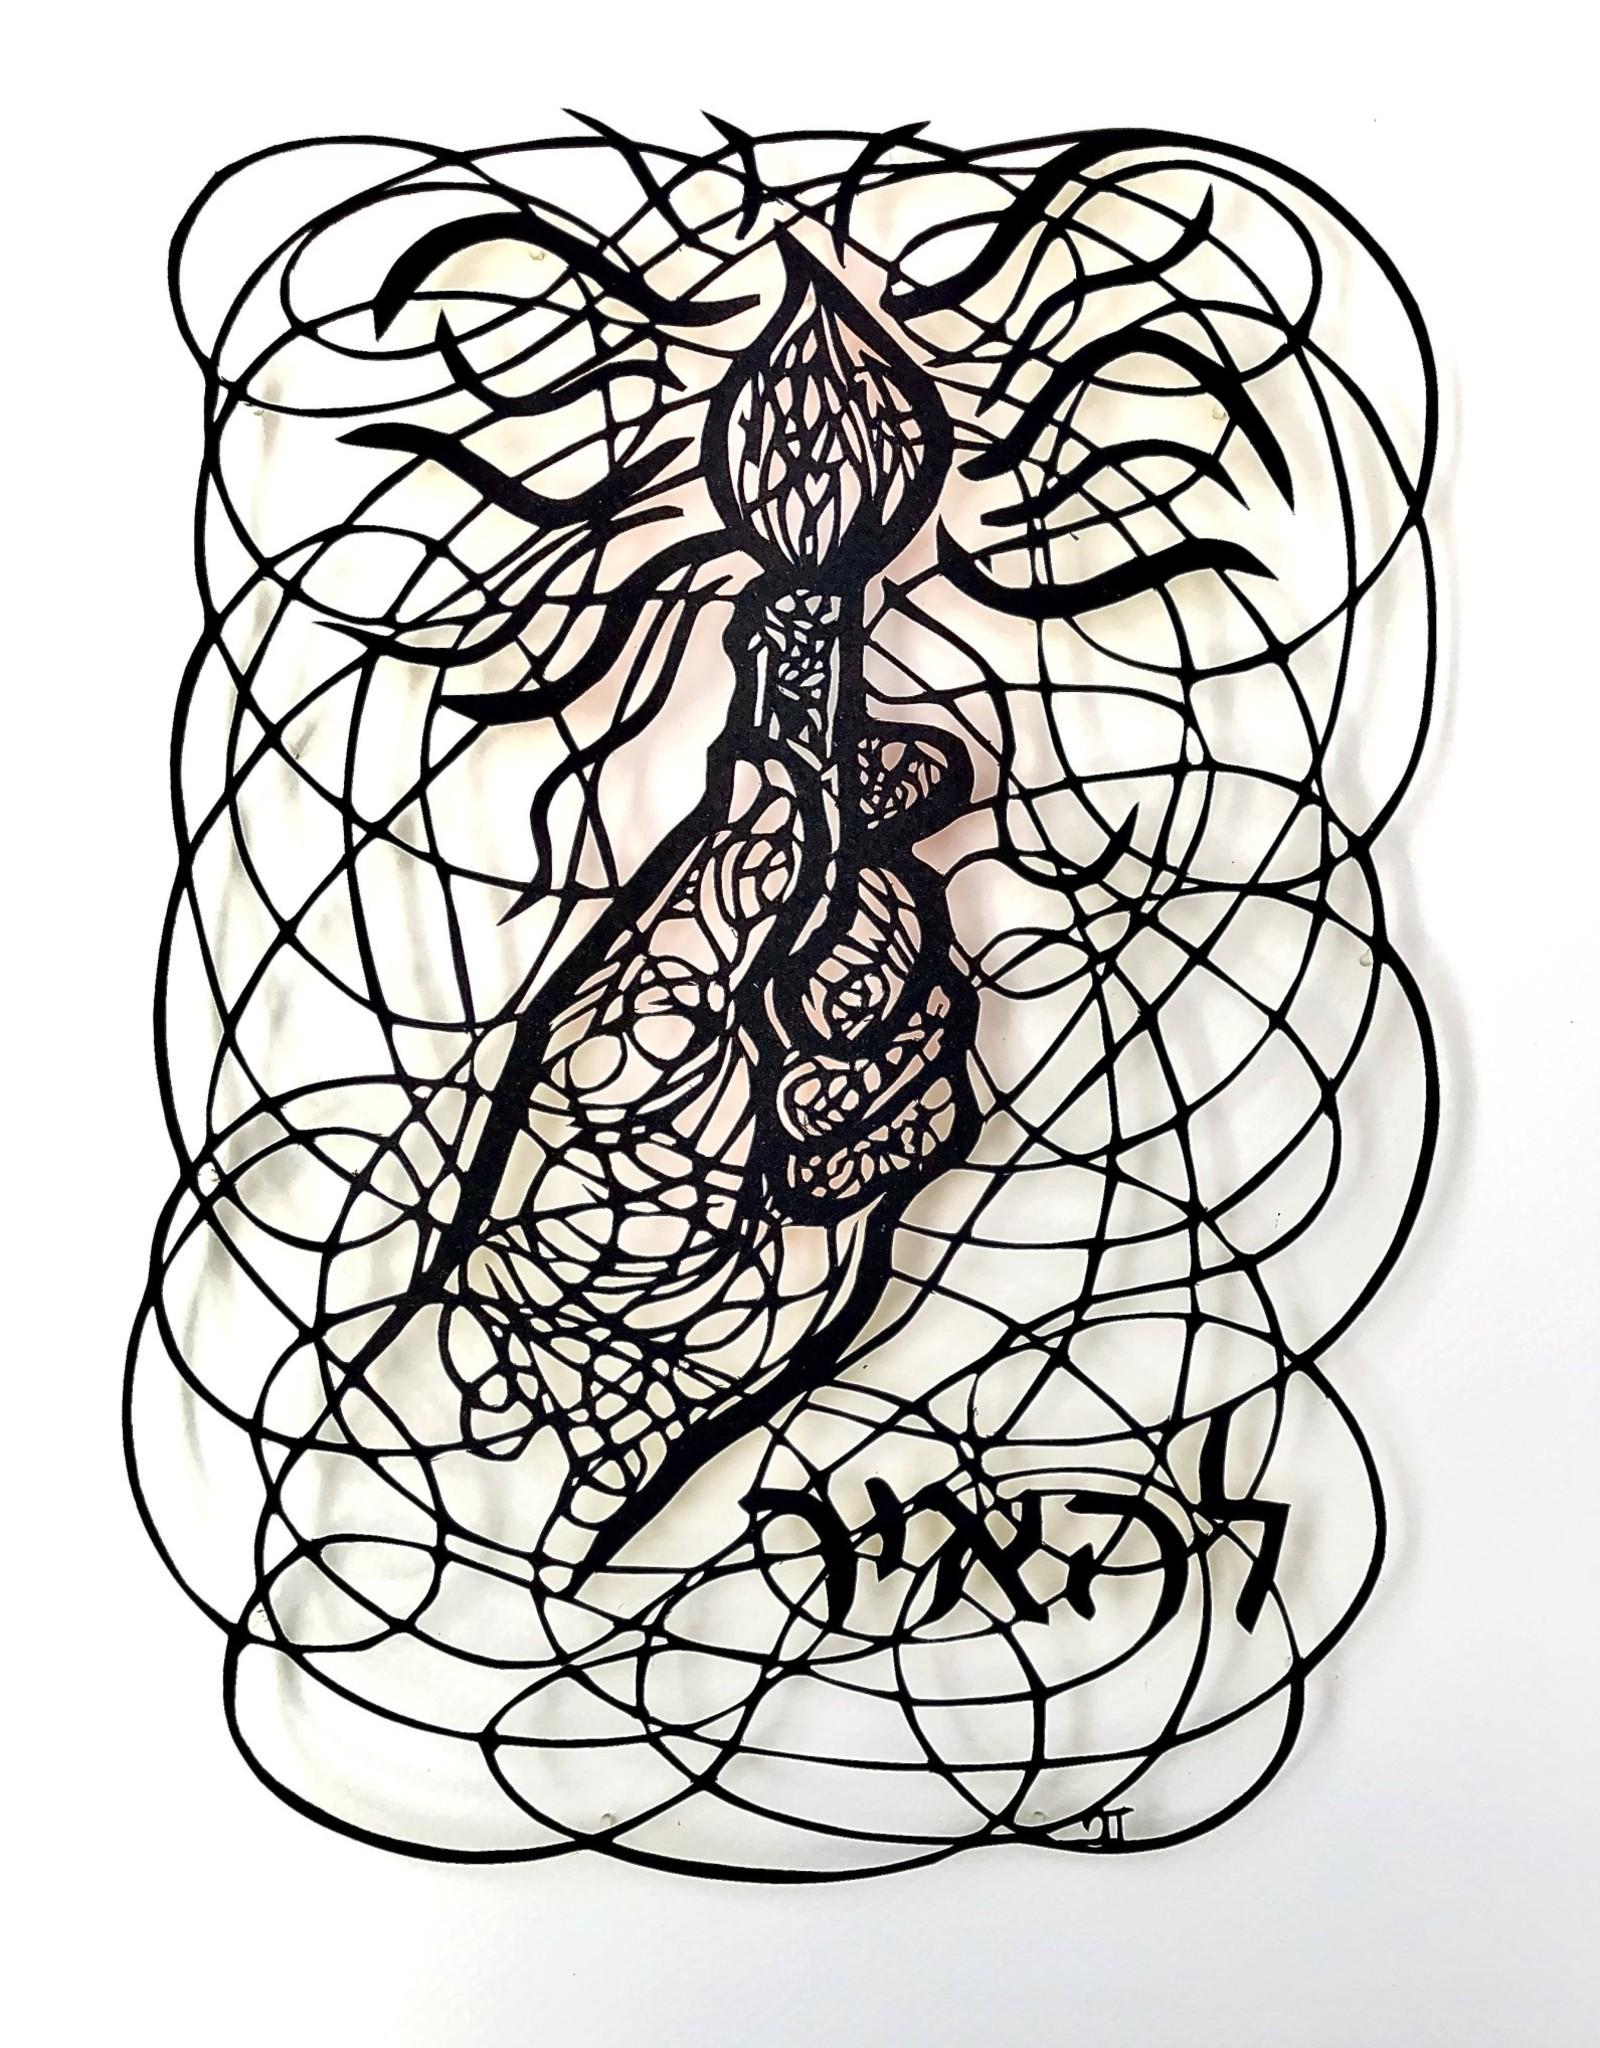 David Friedman To The Light - L'haOr Papercutting